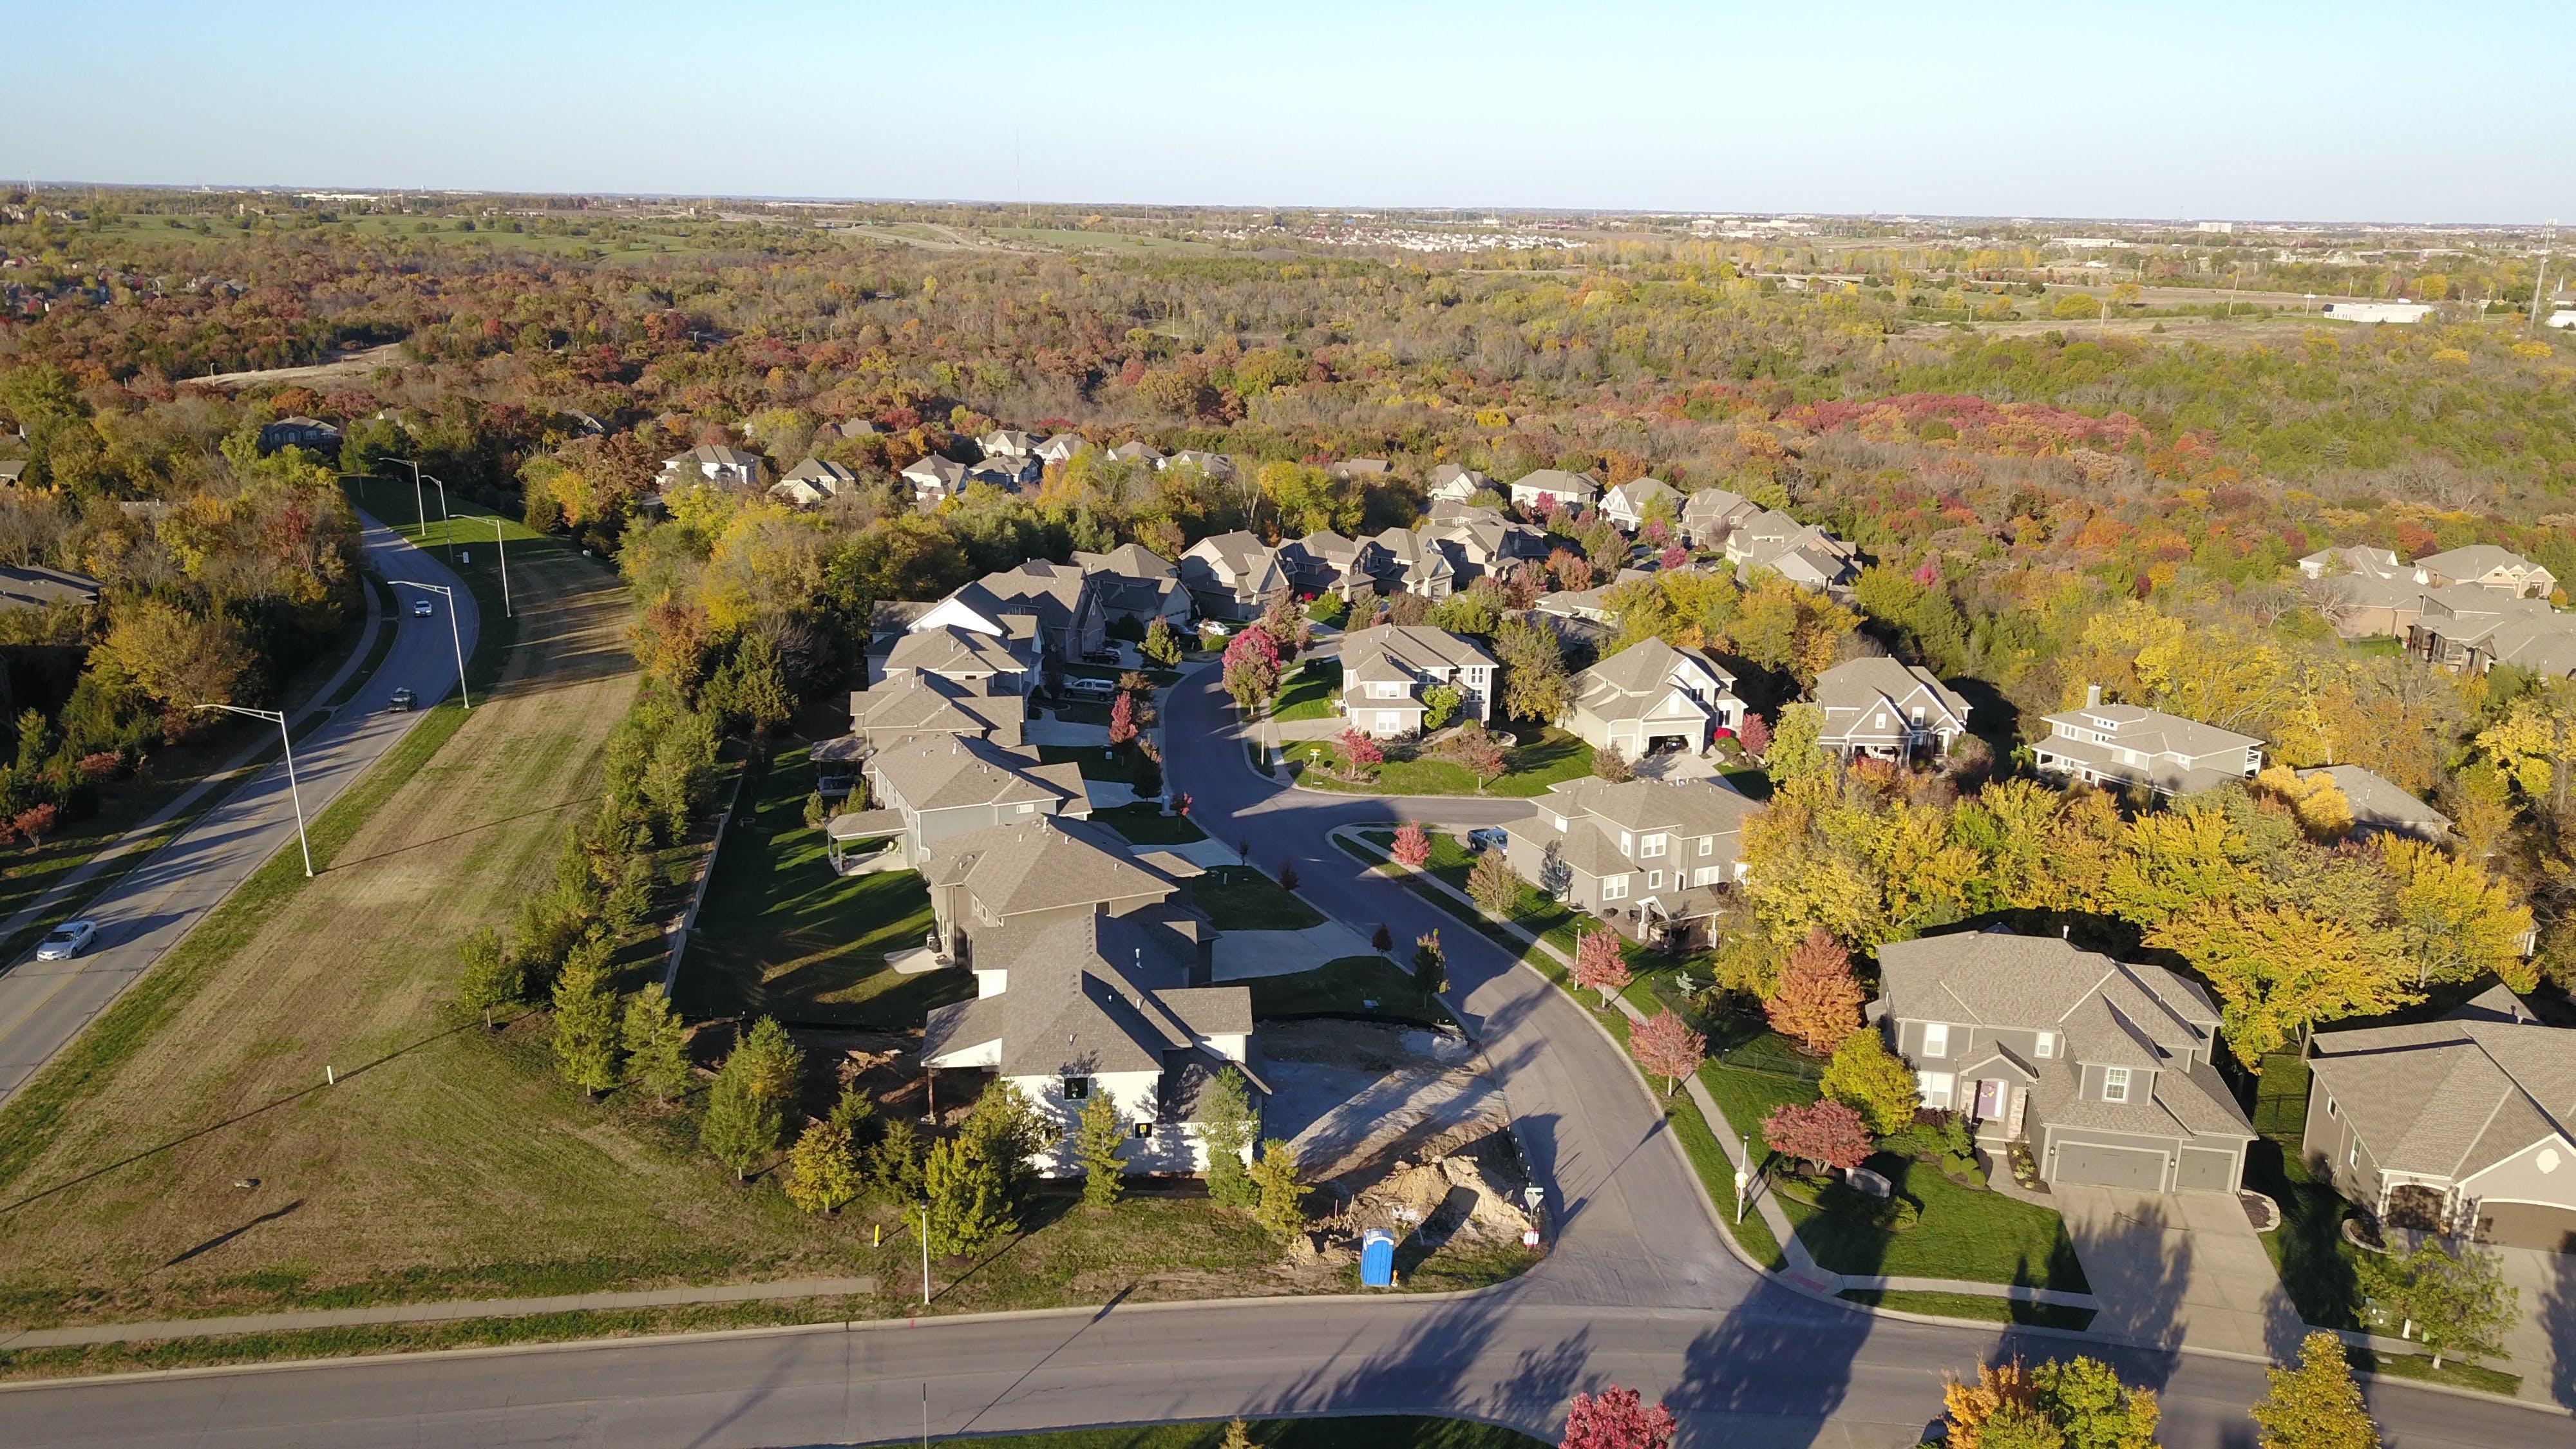 Free stock photo of neighborhood, real estate, autumn colors, suburb